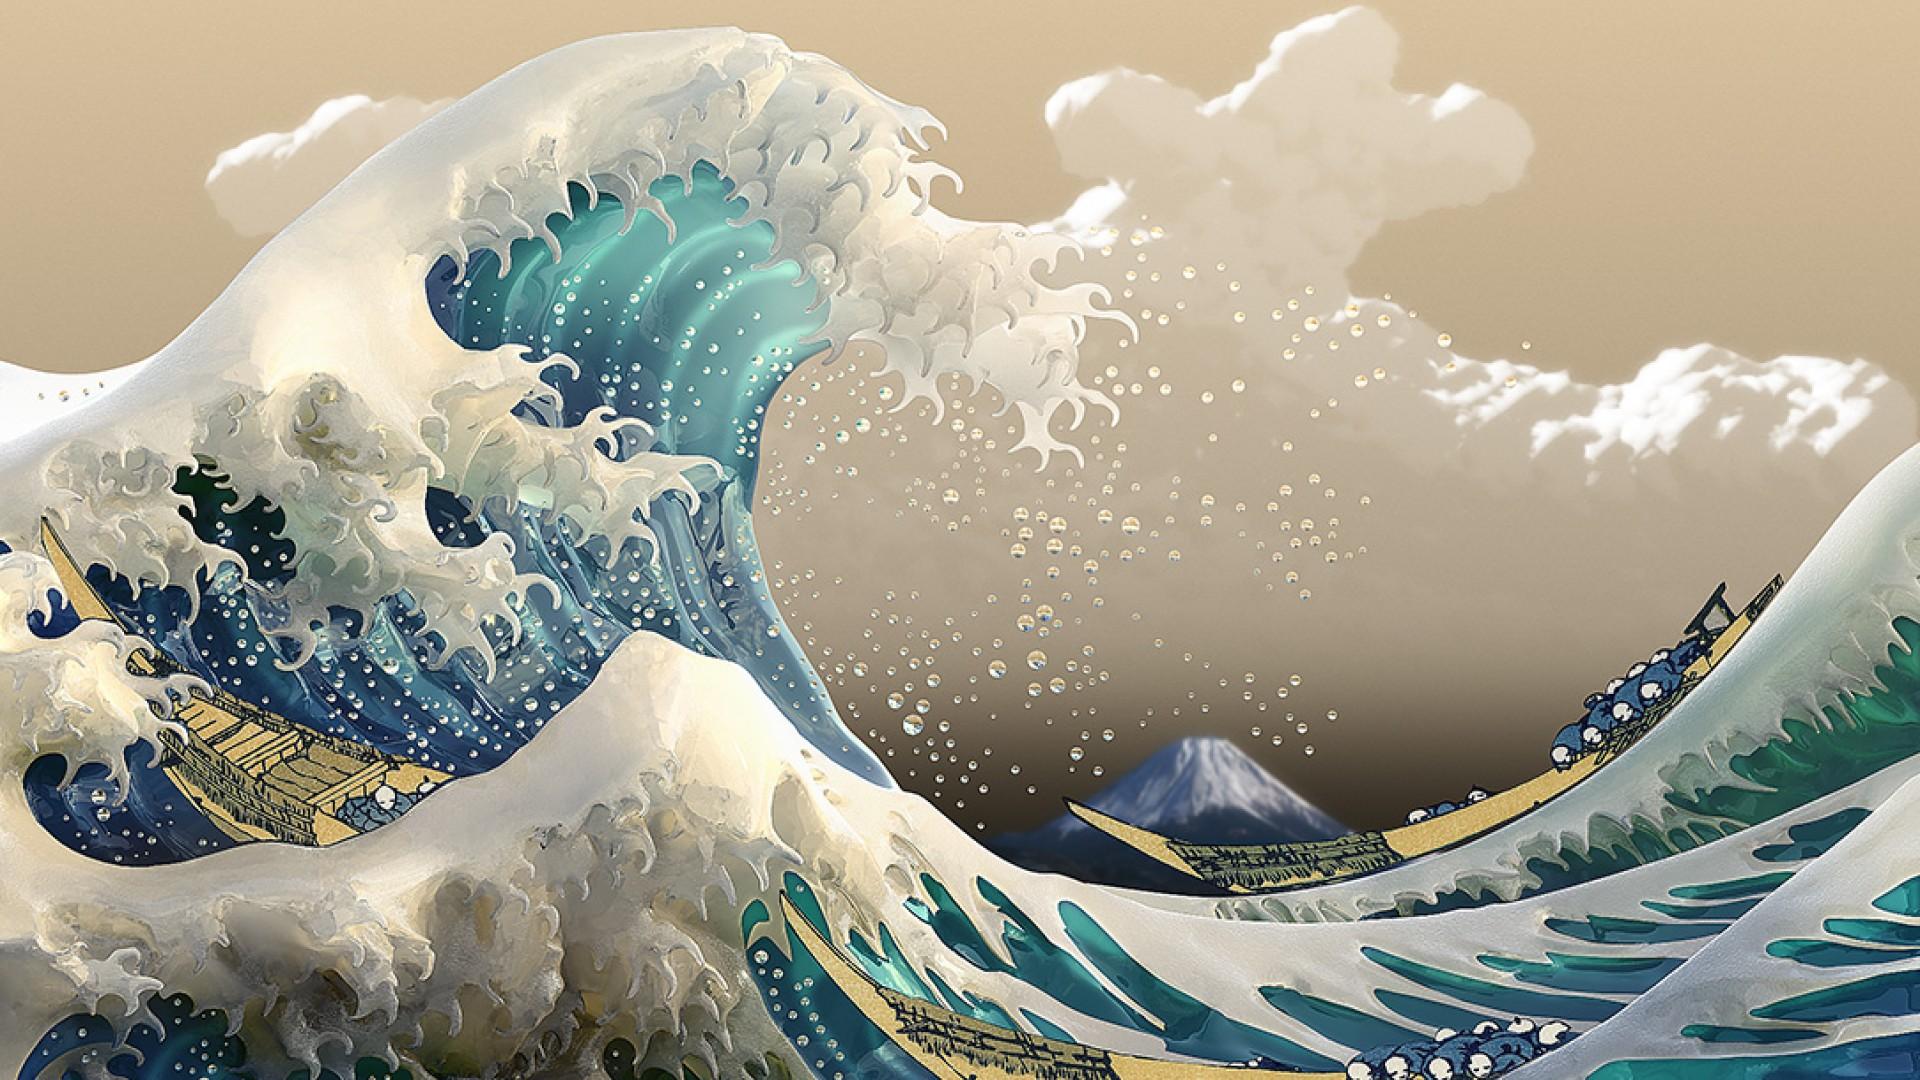 Free Download Screenheaven The Great Wave Off Kanagawa Ocean Waves